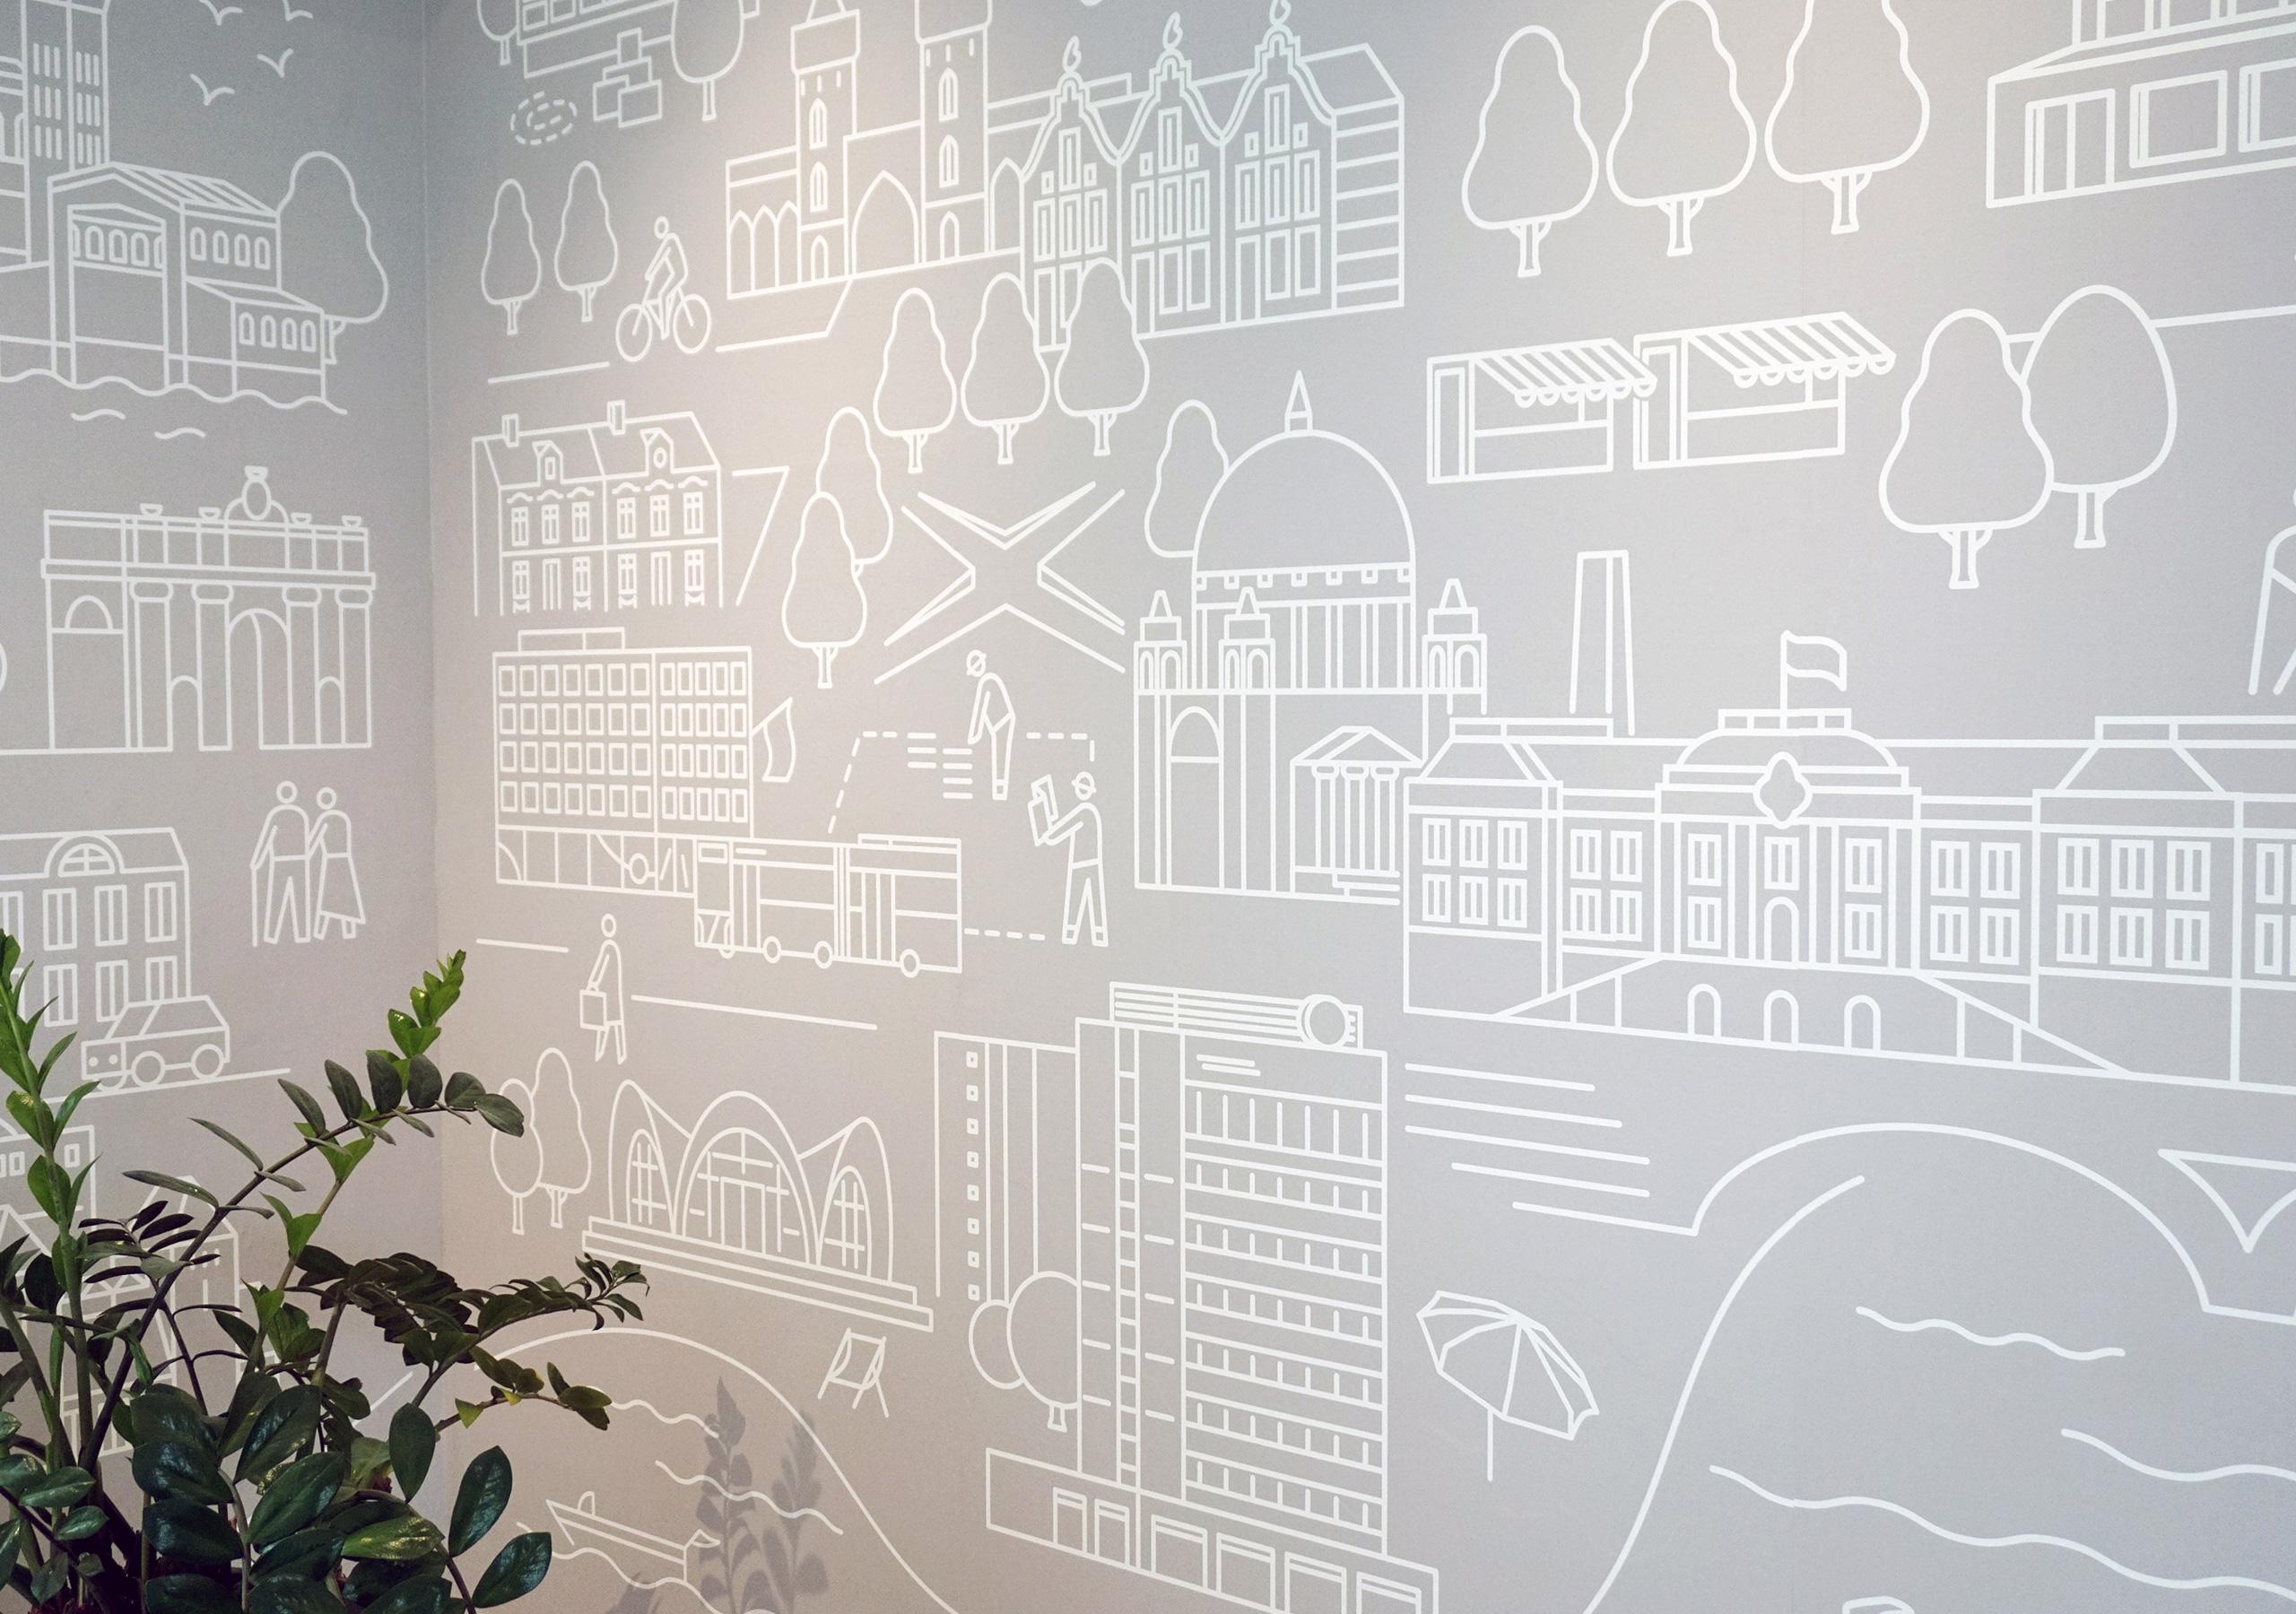 ProPotsdam: Wir machen Stadt, Wandgrafik